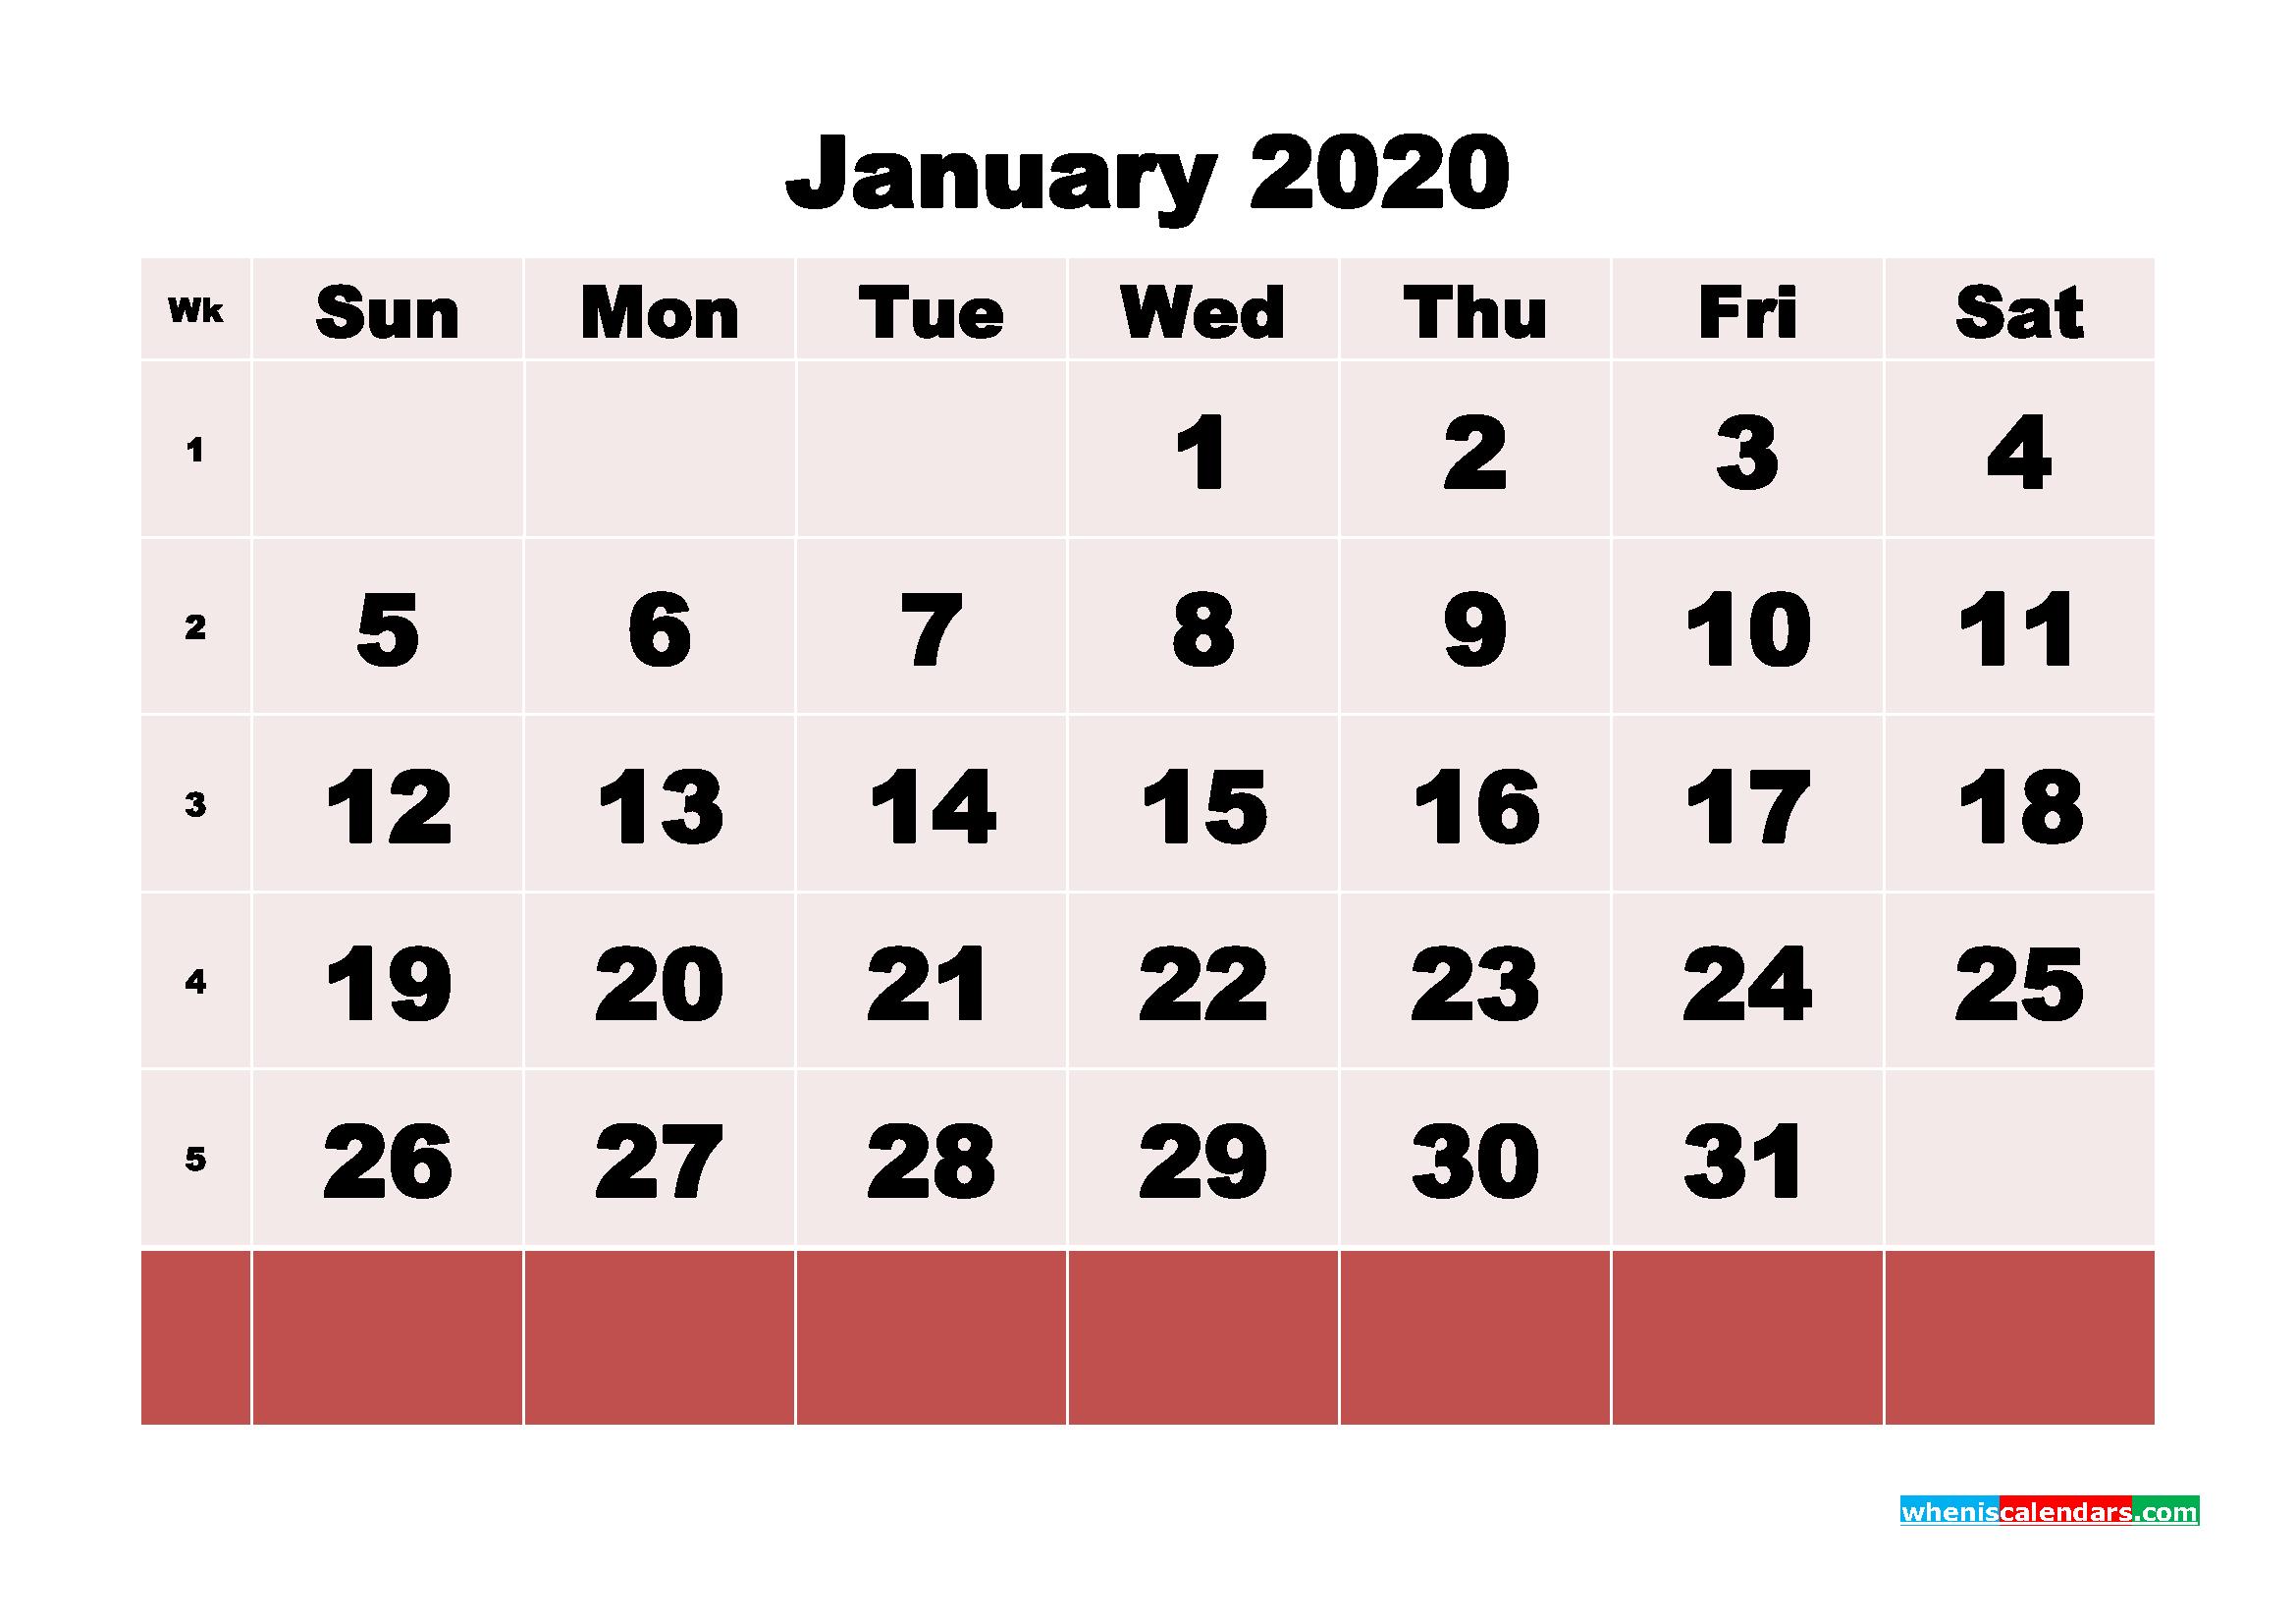 Free Printable January 2020 Calendar - No.m20b97